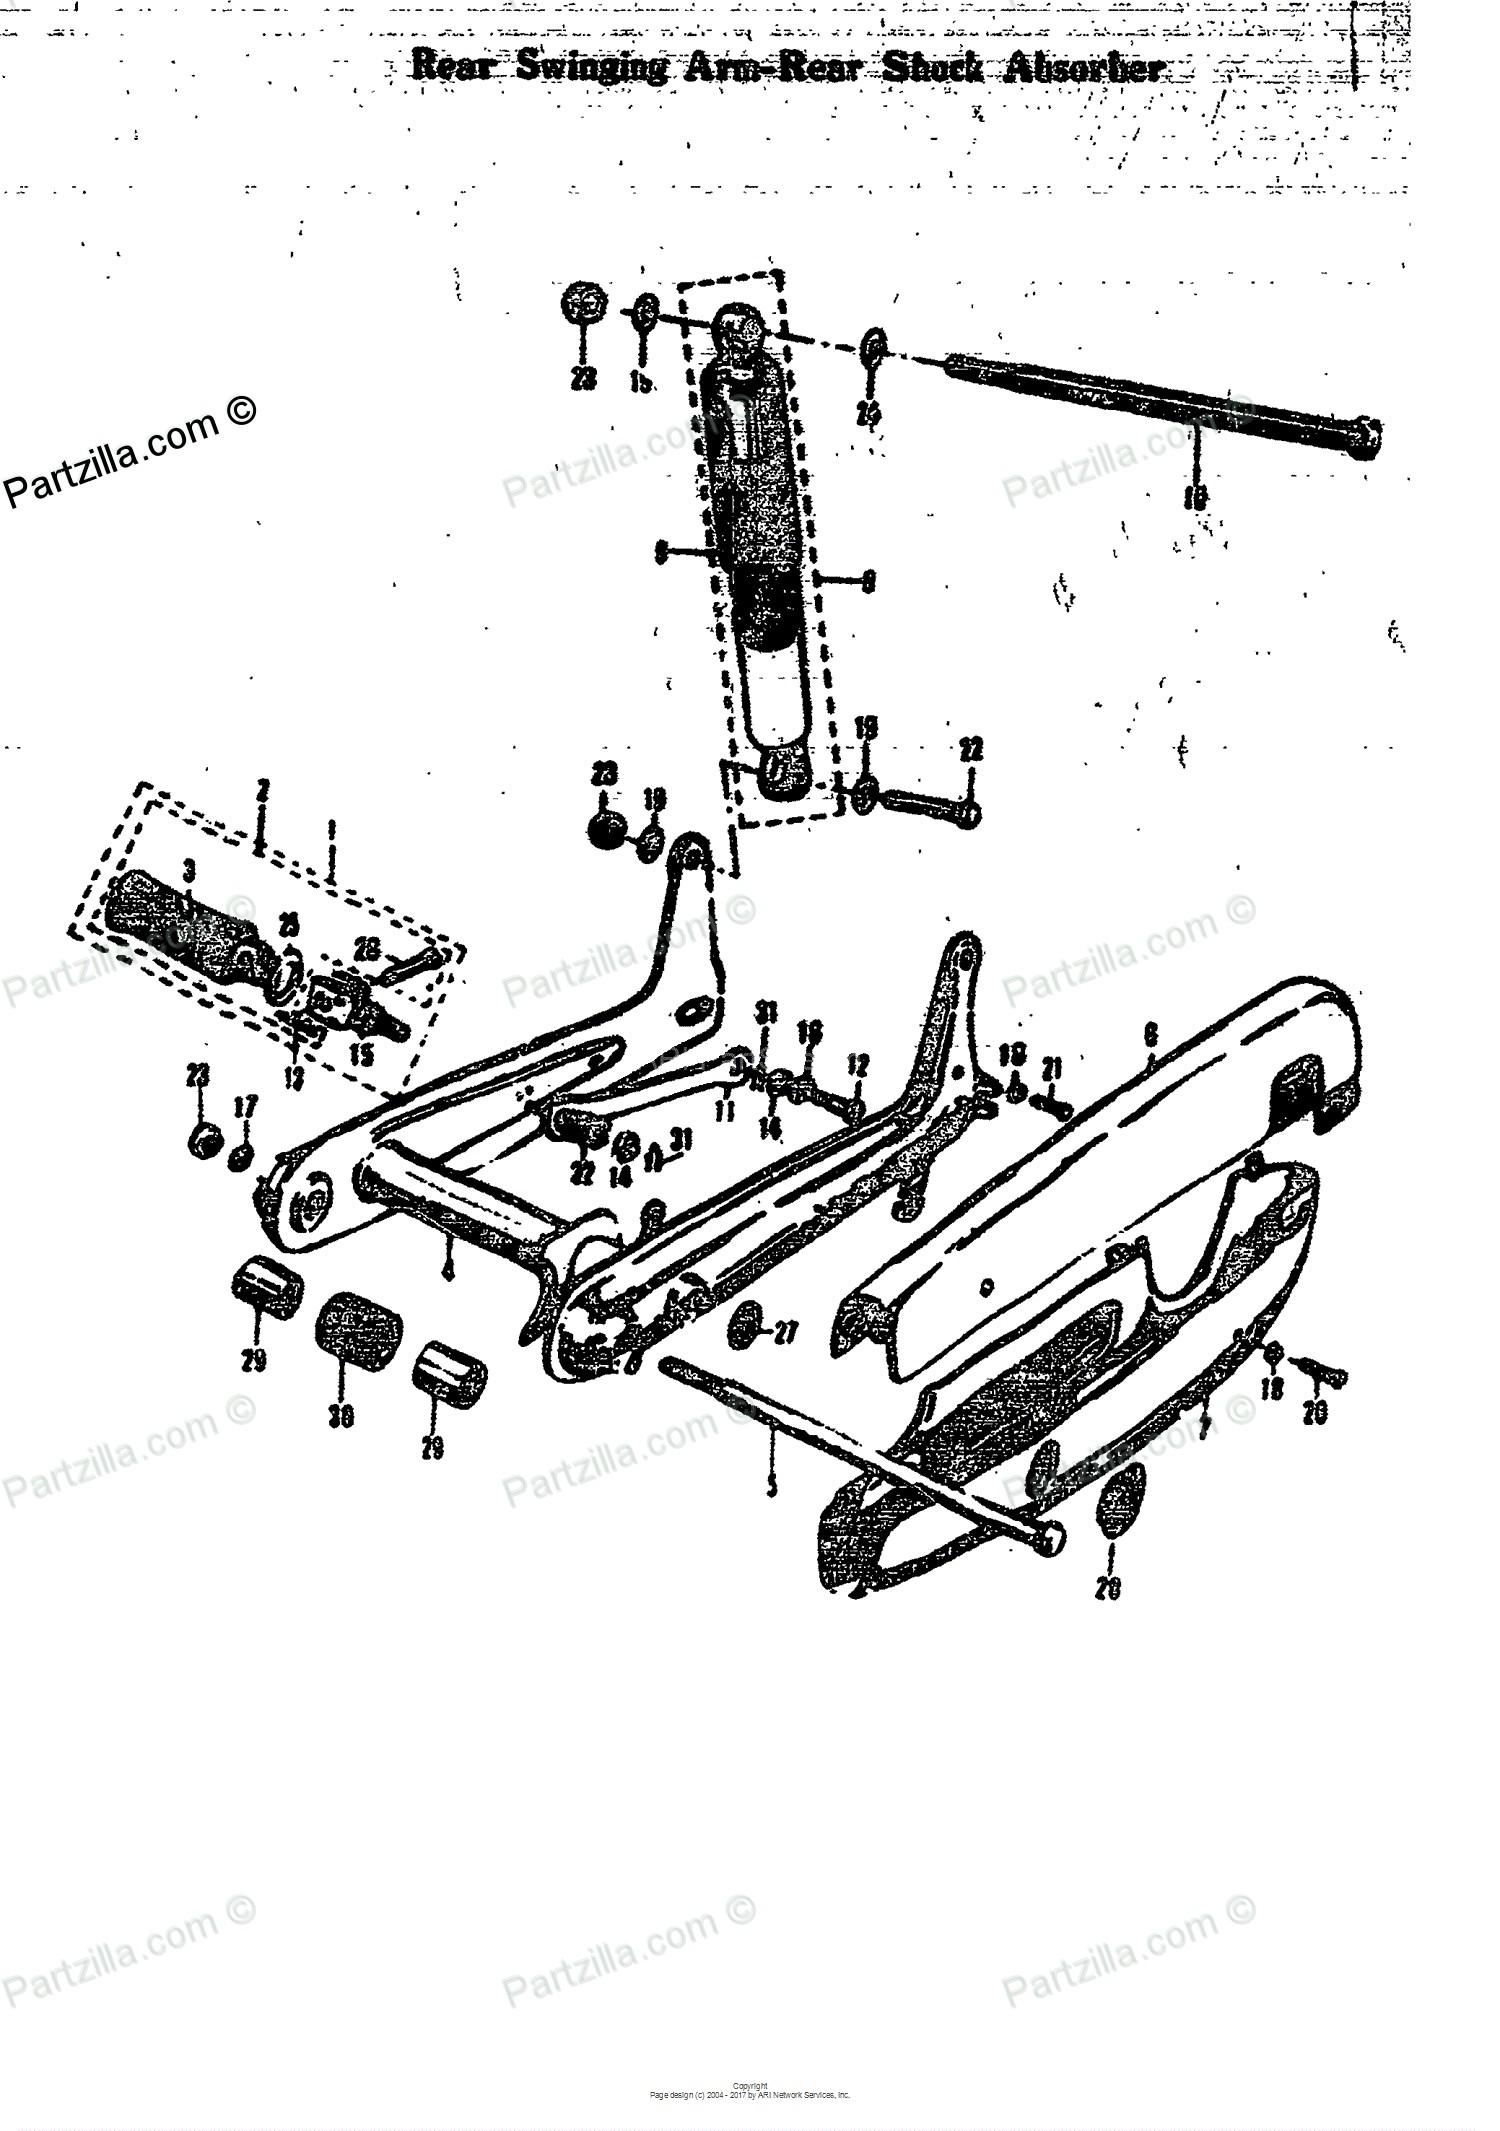 Car Shock Absorber Diagram Suzuki Motorcycle 1968 Oem Parts Diagram for Rear Swinging Arm Rear Of Car Shock Absorber Diagram